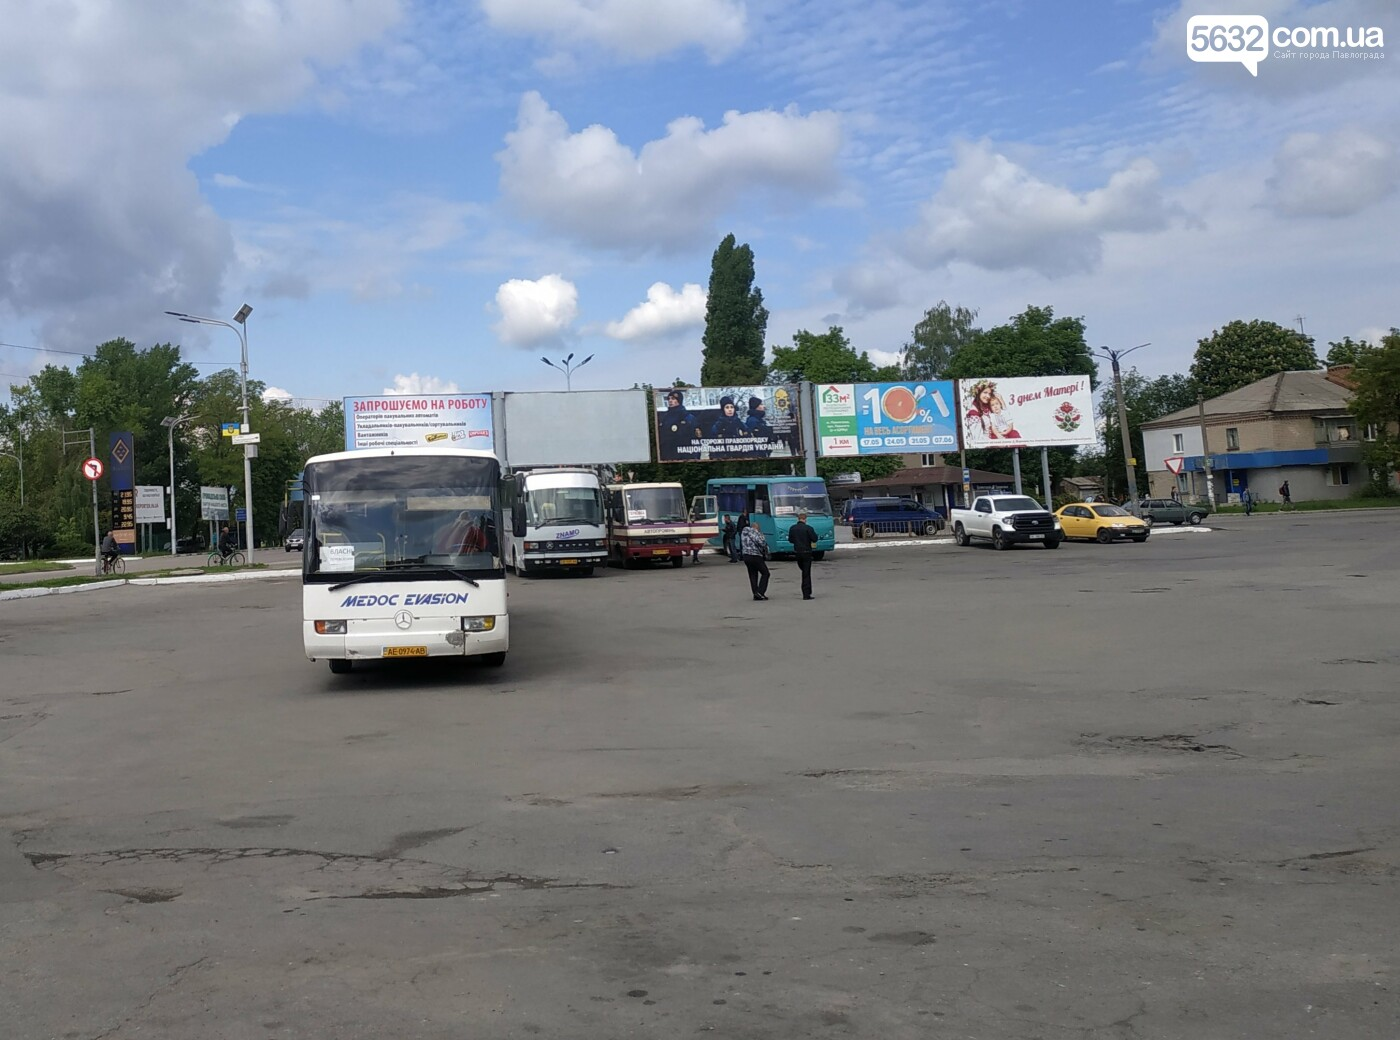 Спустя 2 месяца в Павлограде снова заработала автостанция (ФОТОФАКТ), фото-2